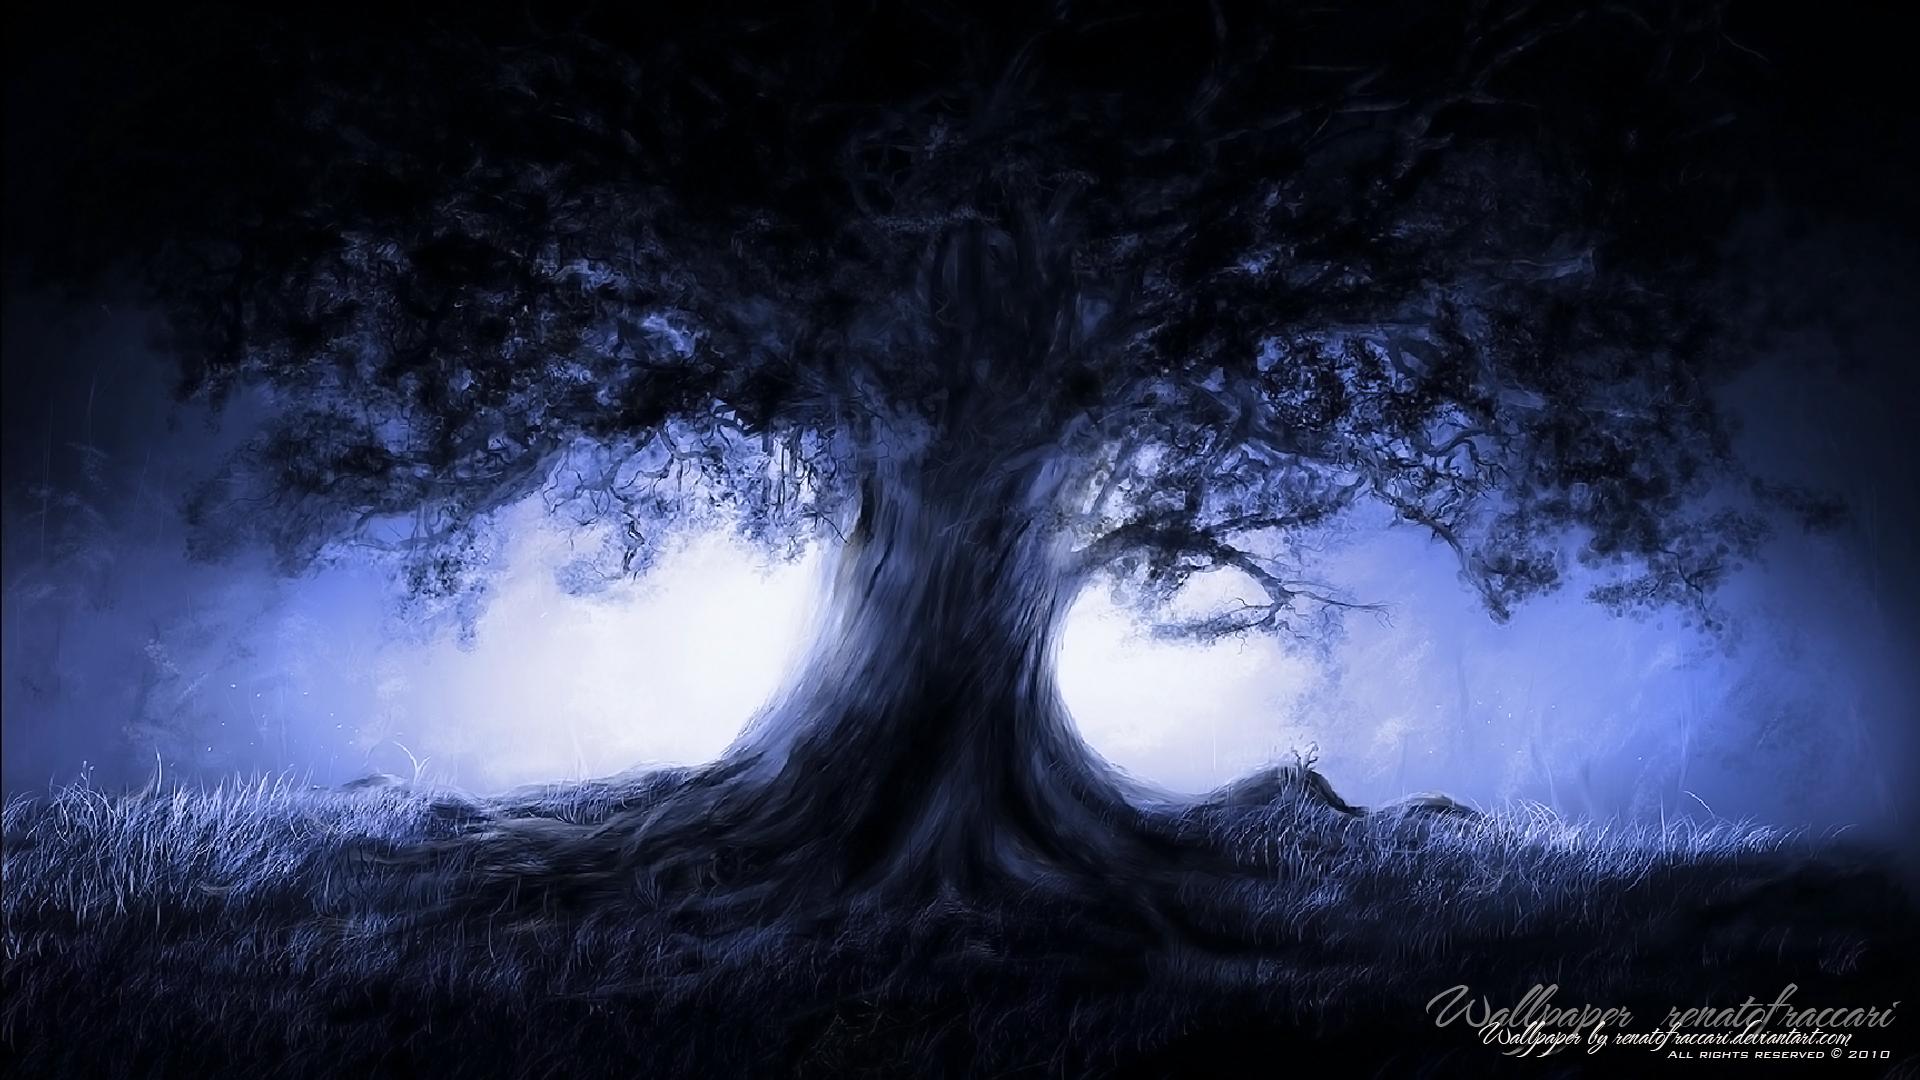 Midnight tree wallpaper background 1920x1080